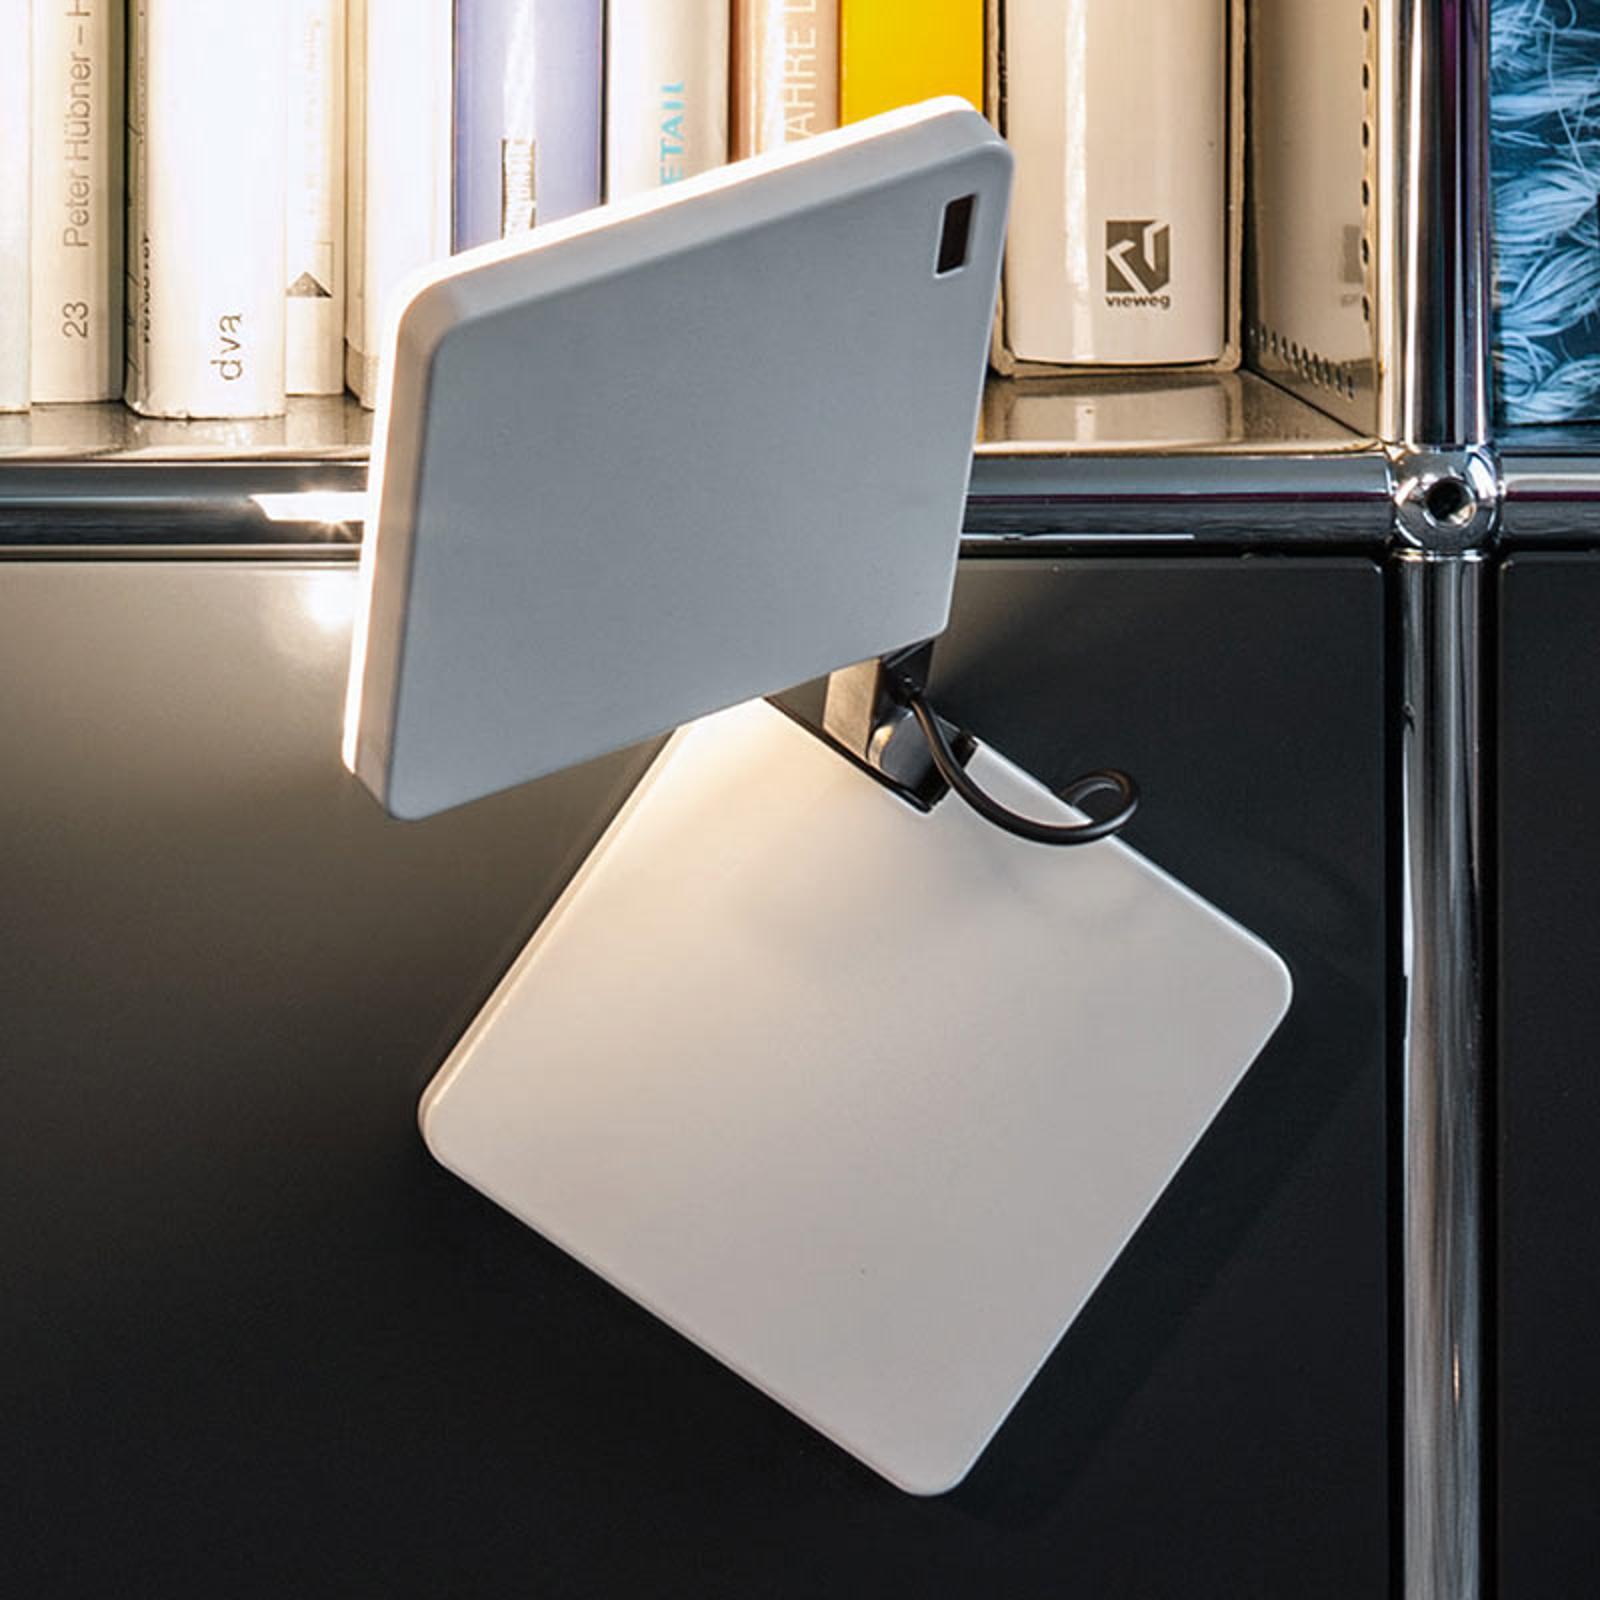 Nimbus Roxxane Fly CL wall mount, self-adhesive_7018050_1